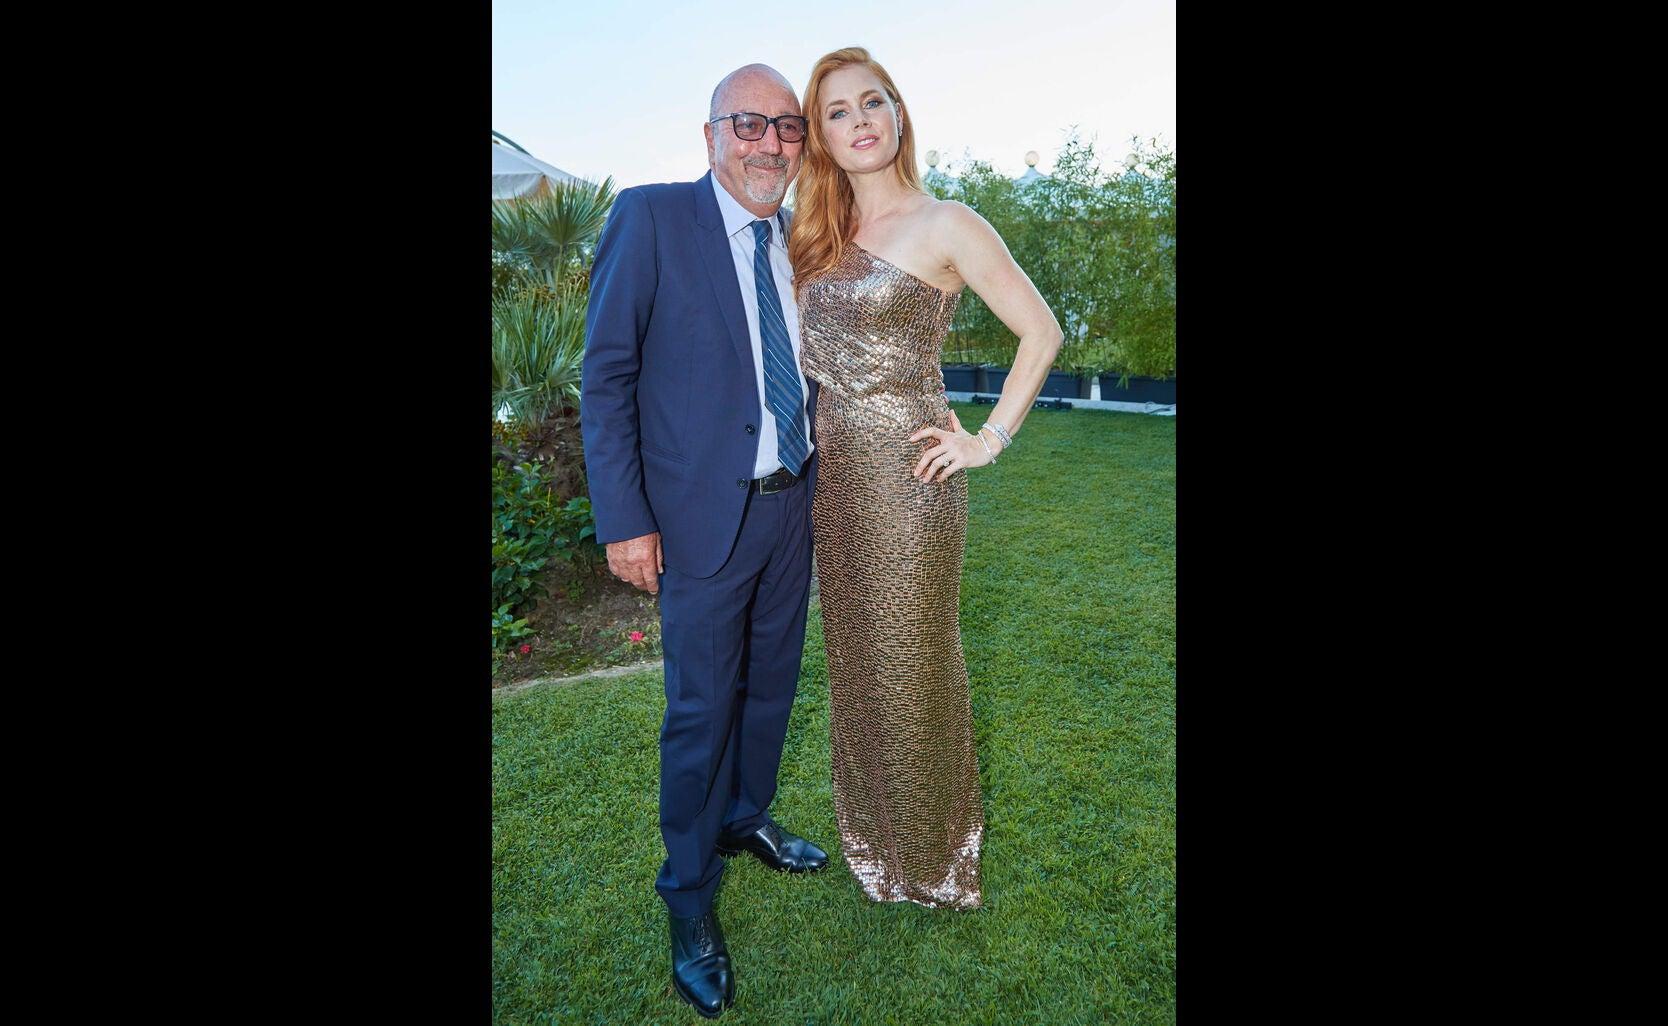 HFPA president Lorenzo Soria, anc Golden Globe nominee Amy AdamsHFPA reception, Venice 2016